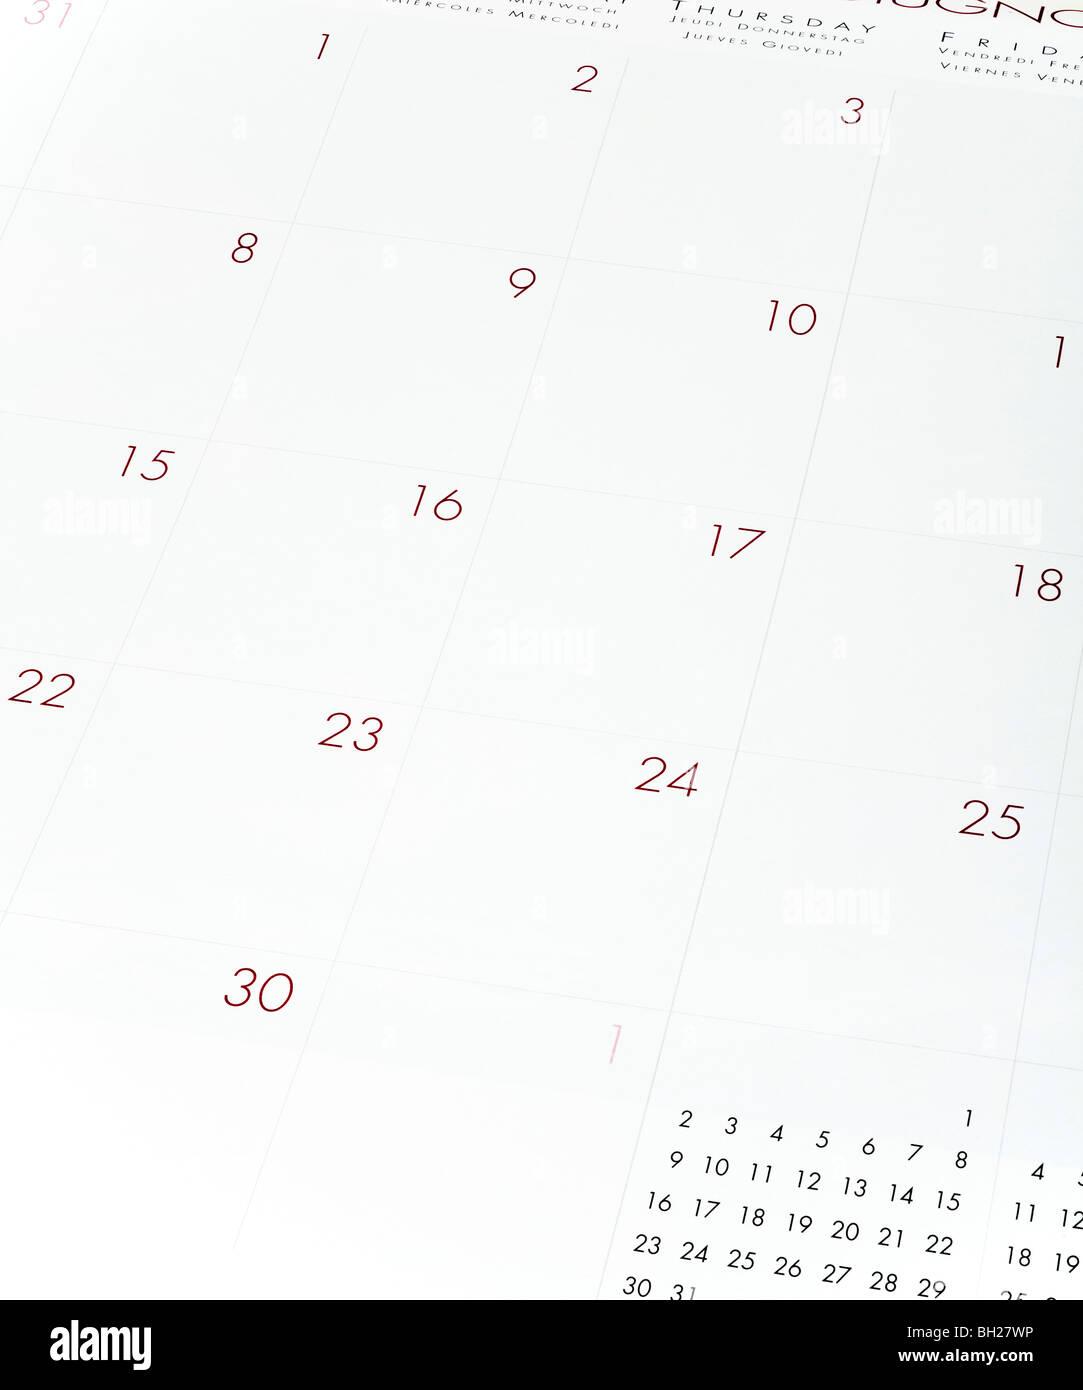 Calendar page close up - Stock Image